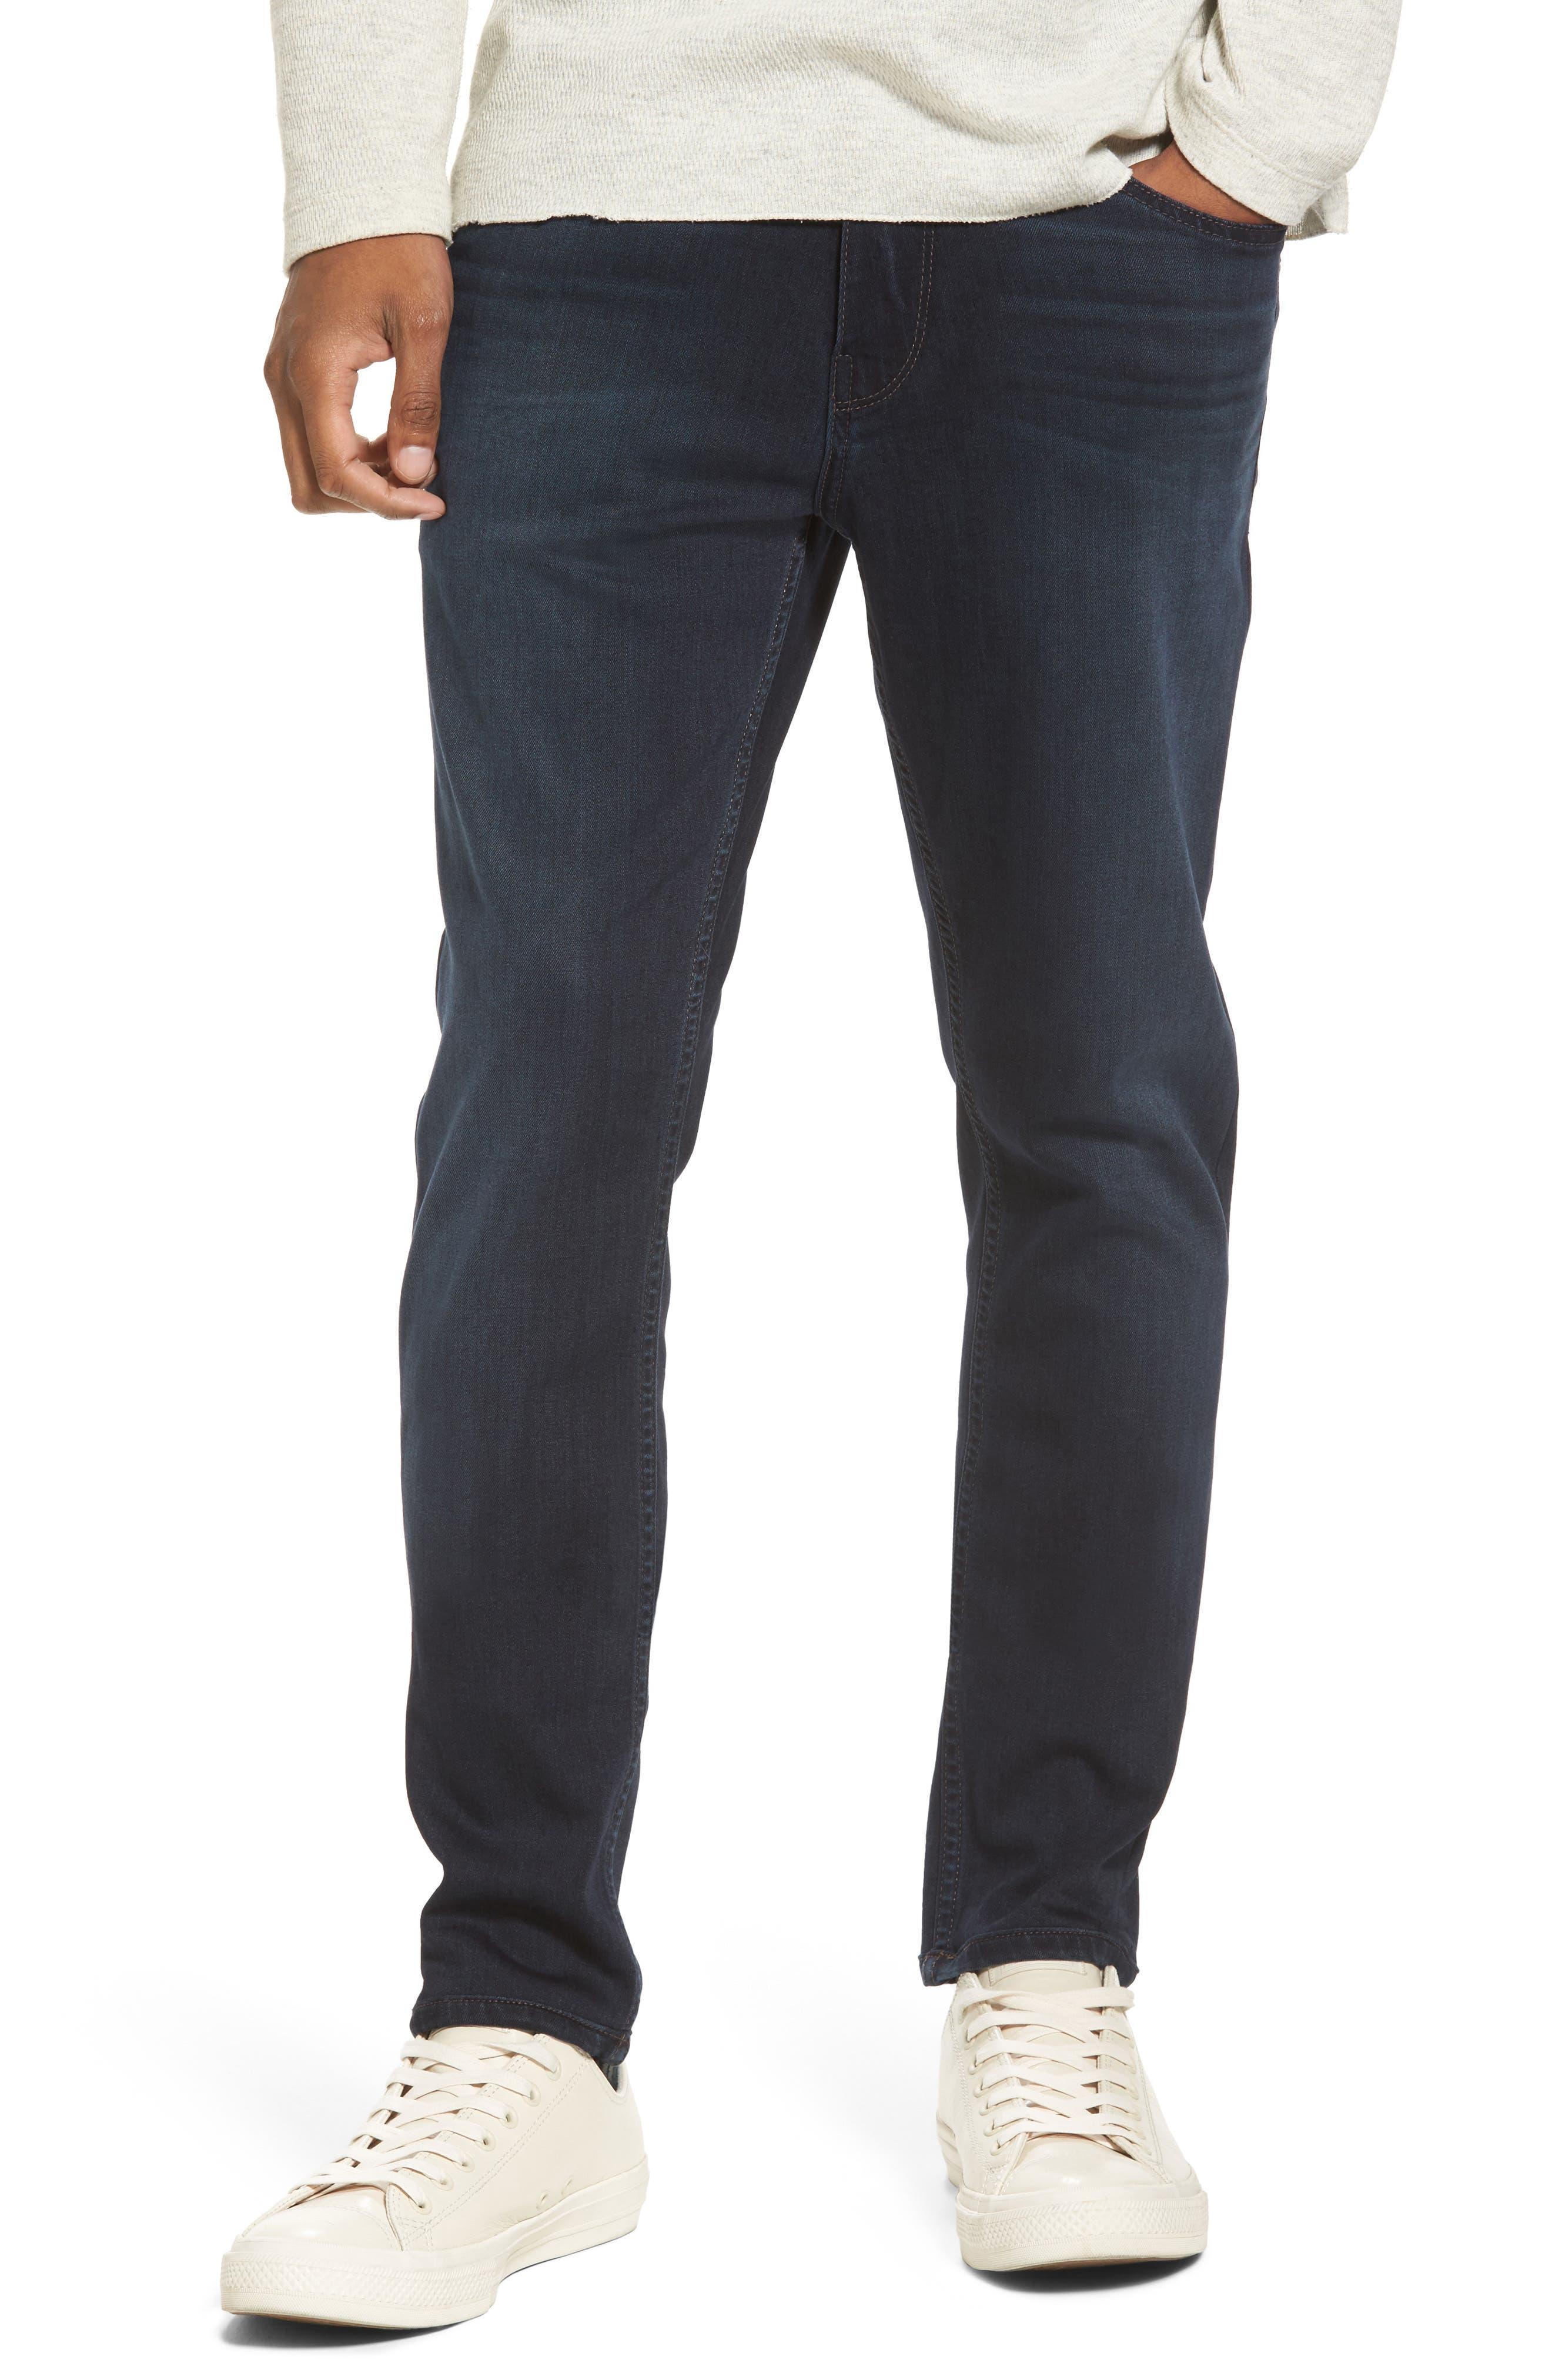 Croft Skinny Fit Jeans,                         Main,                         color, 400